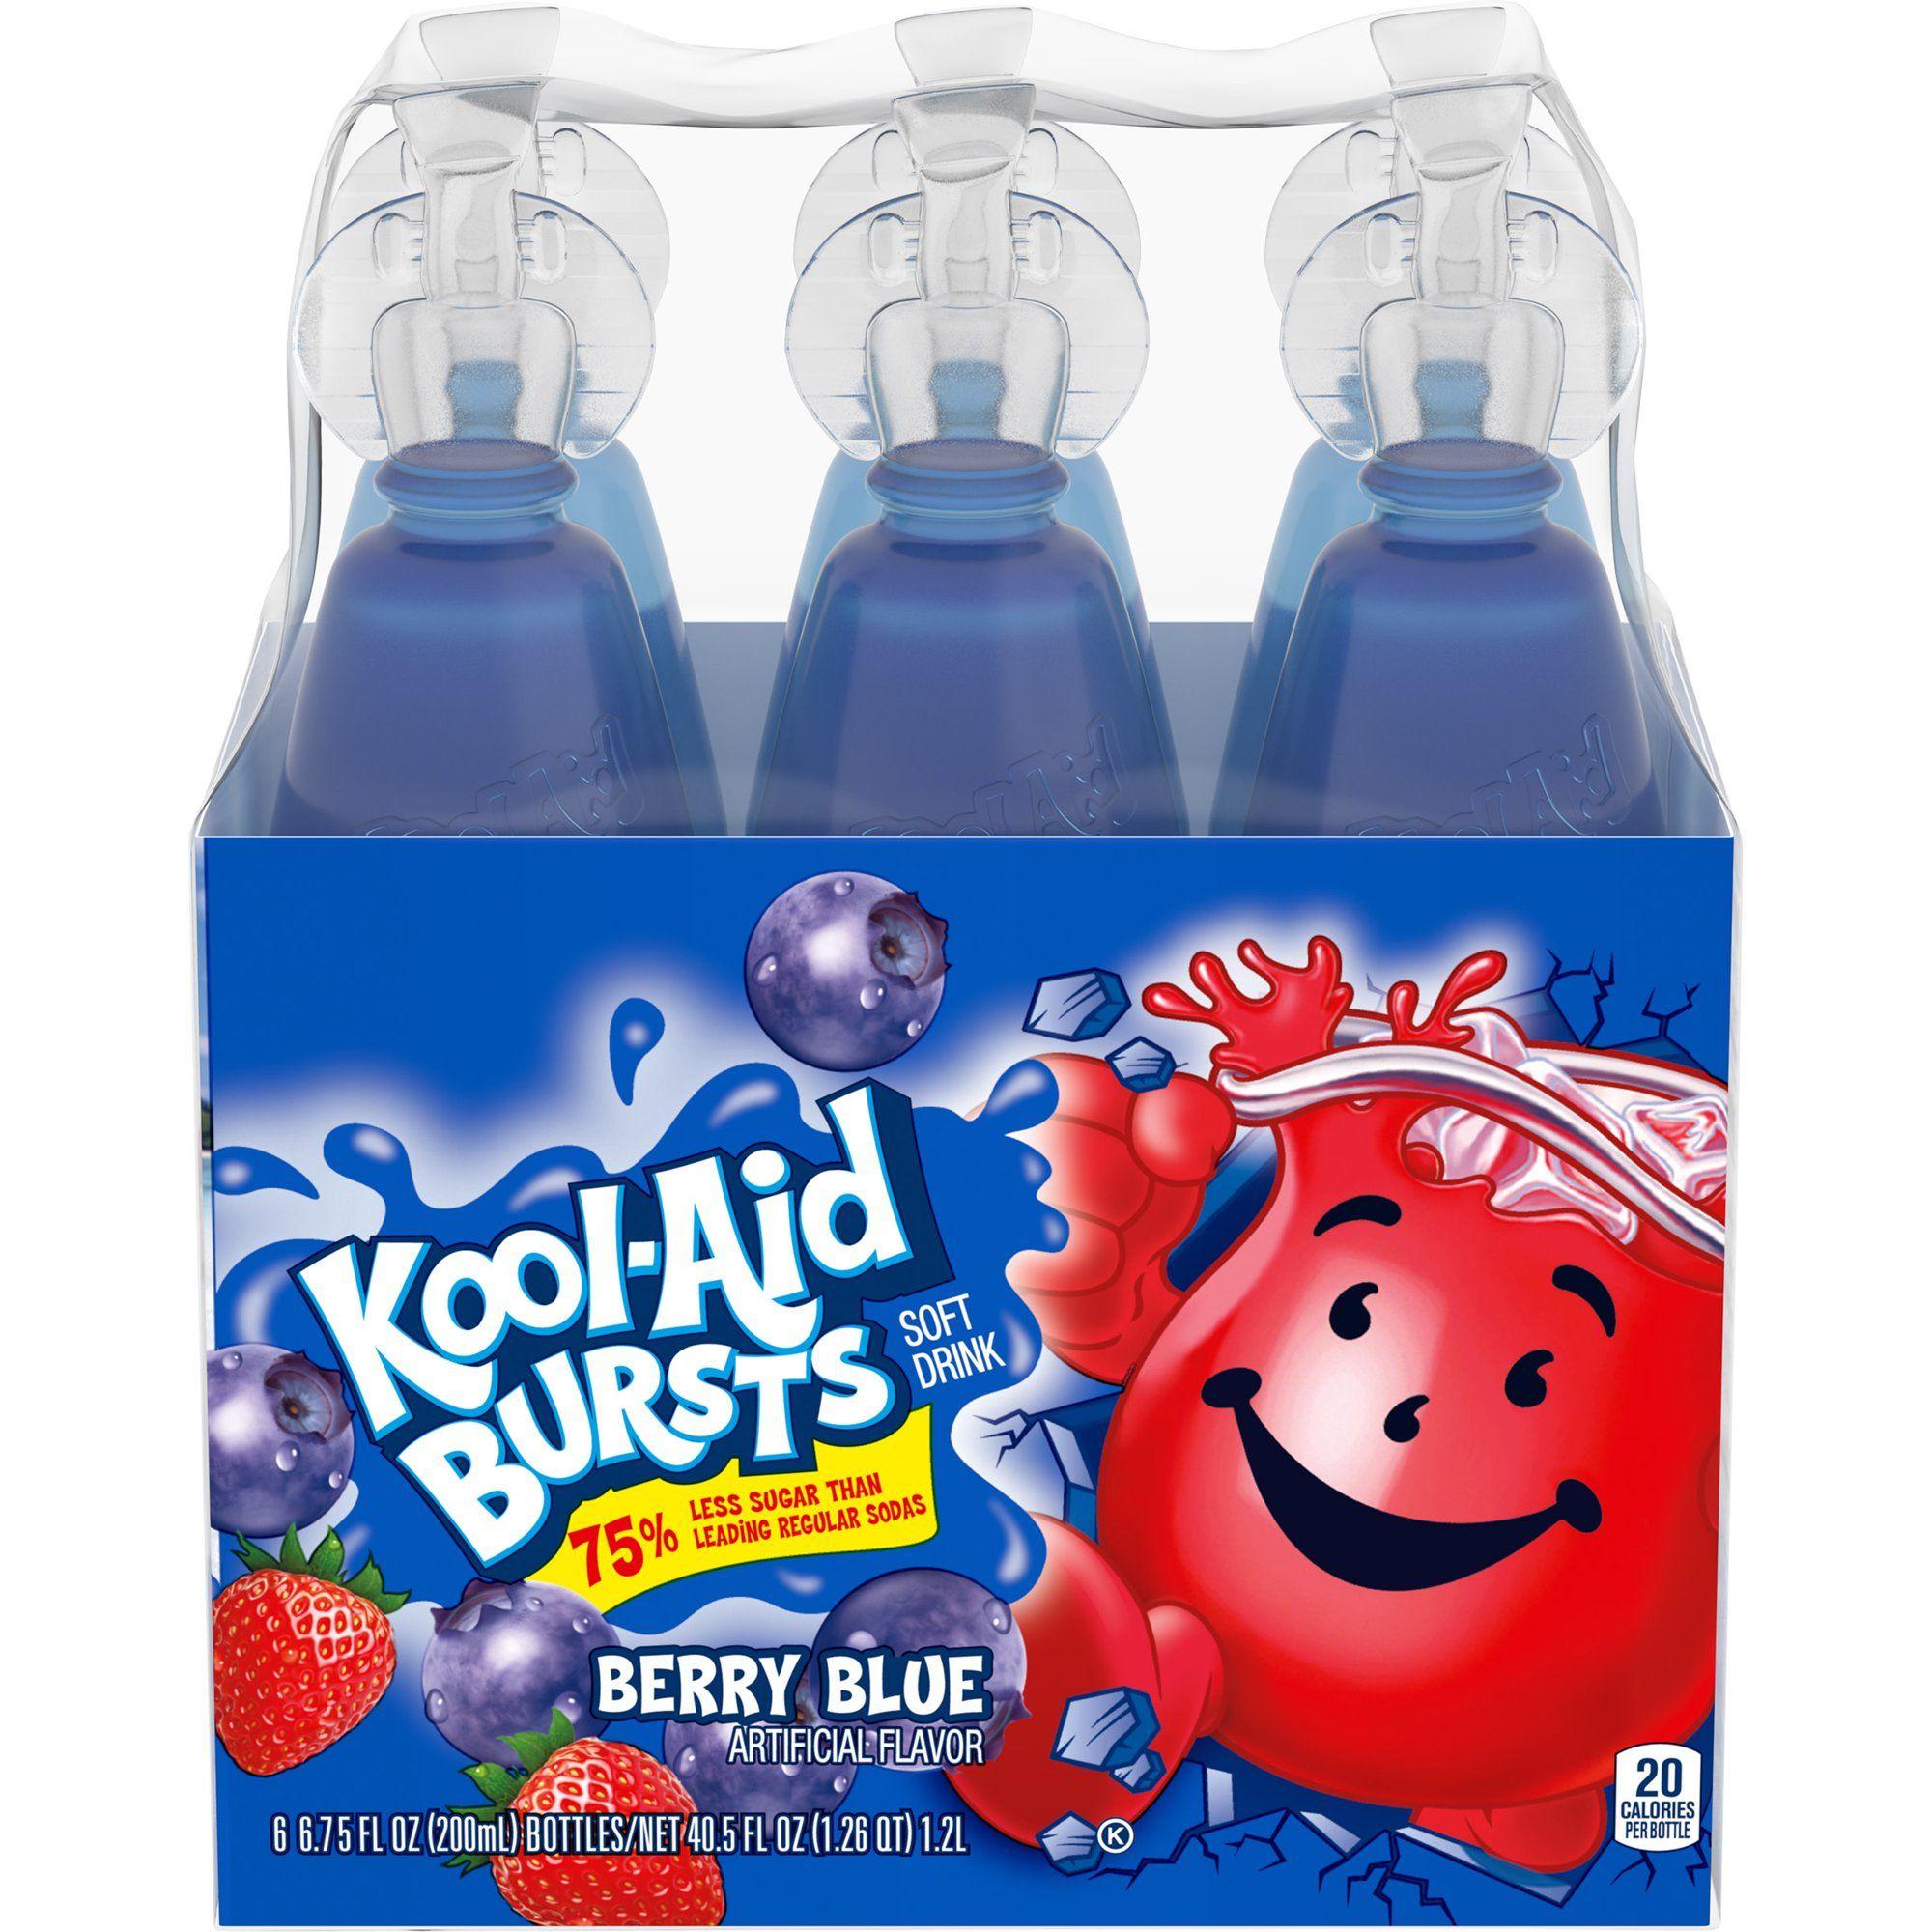 Kool Aid Bursts Berry Blue Artificially Flavored Soft Drink 6 Ct Pack 6 75 Fl Oz Bottles Walmart Com In 2021 Kool Aid Soft Drinks Kid Drinks